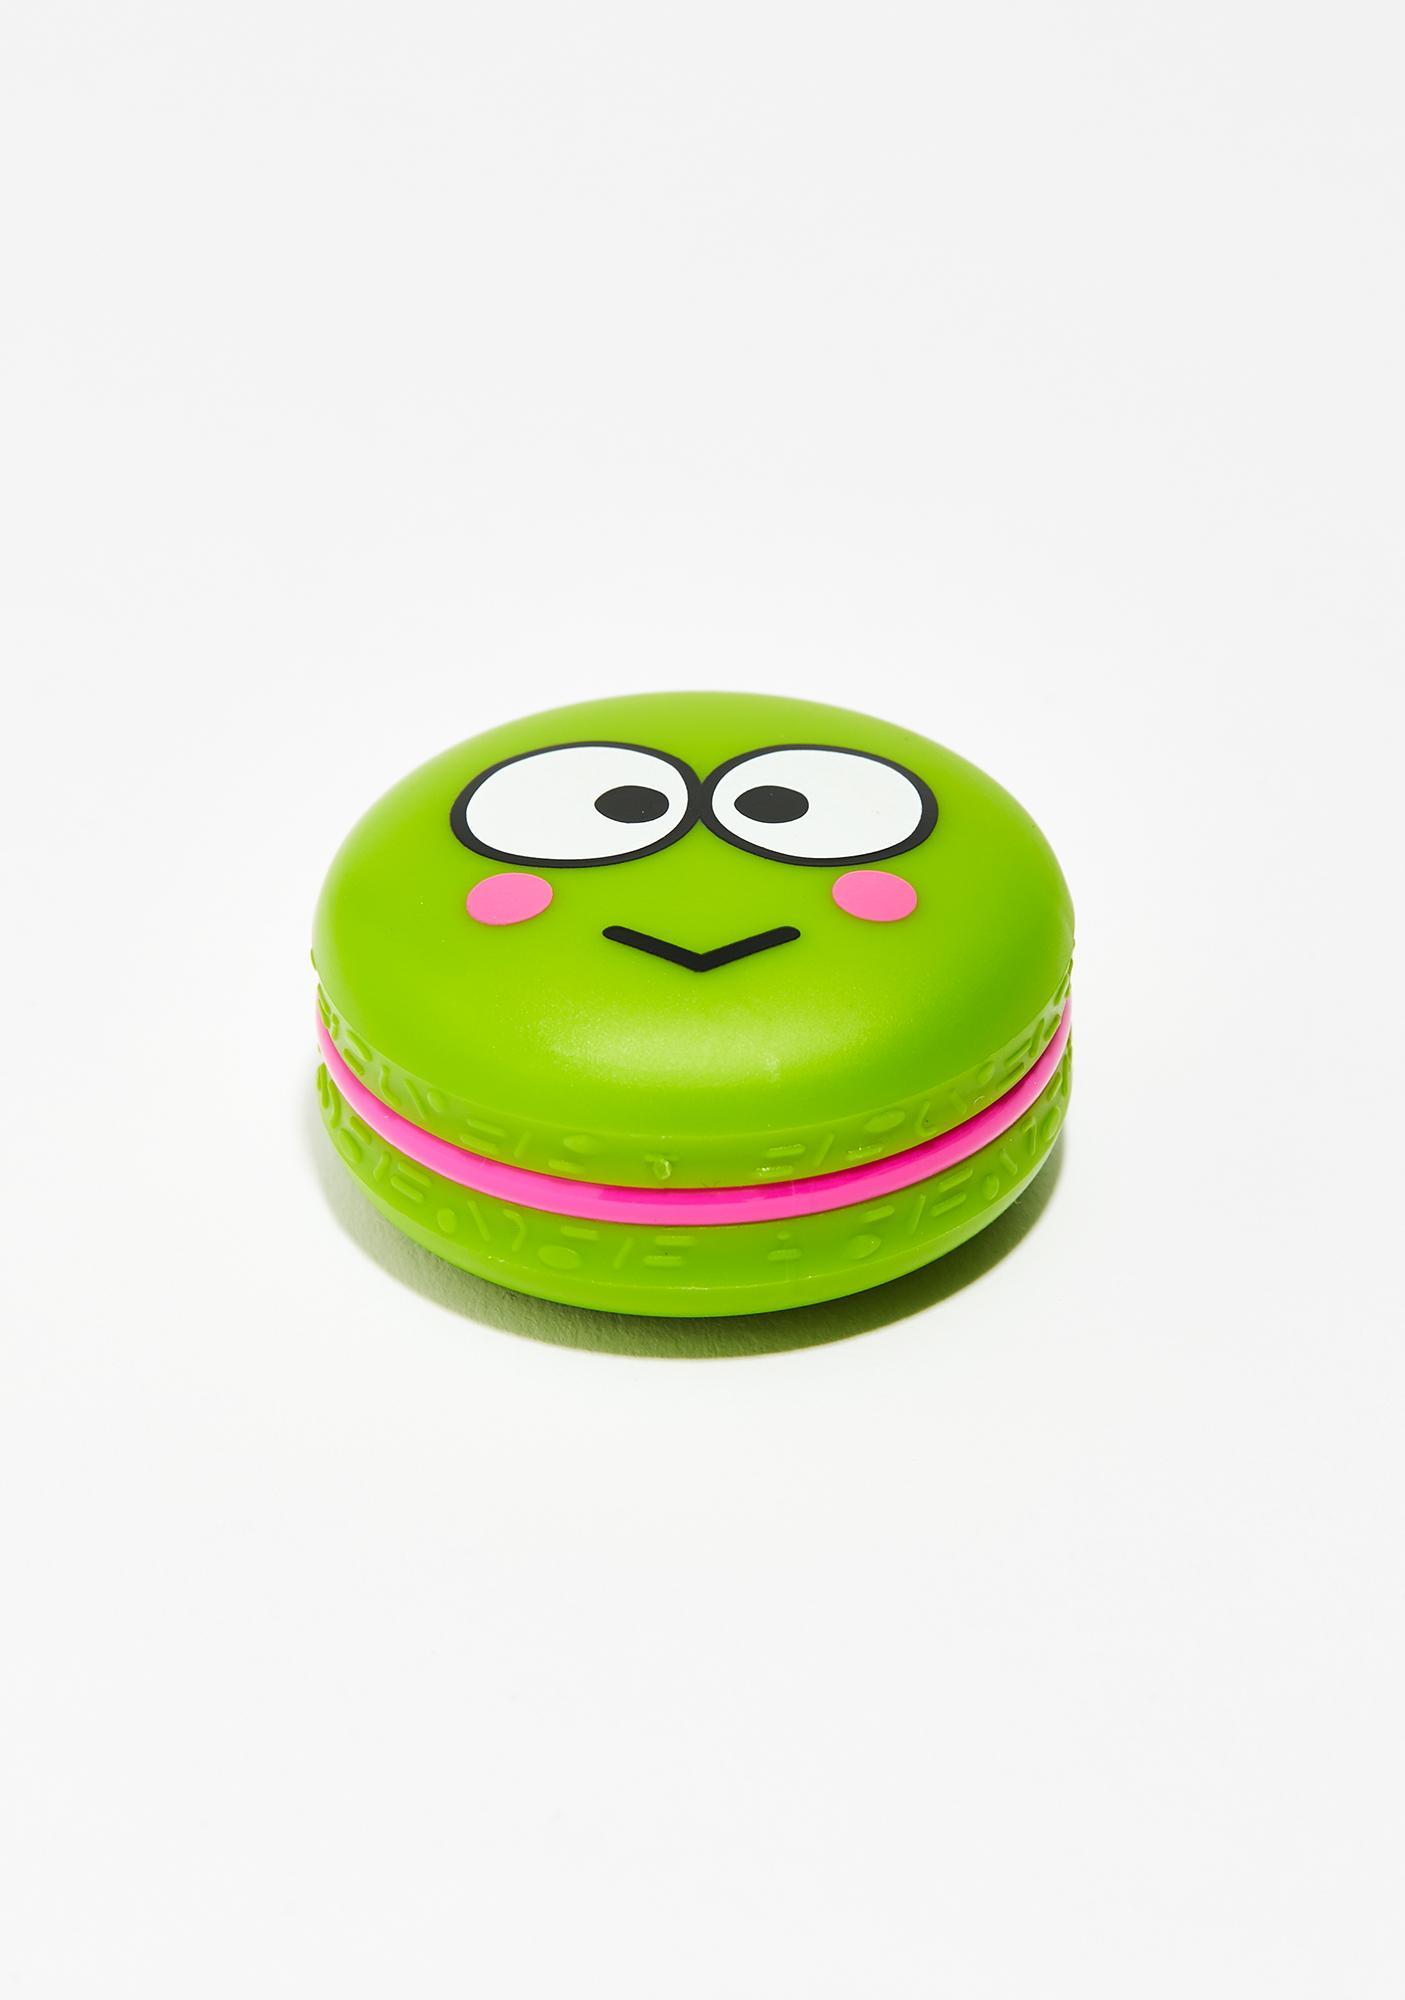 The Crème Shop Keroppi Macaron Lip Balm